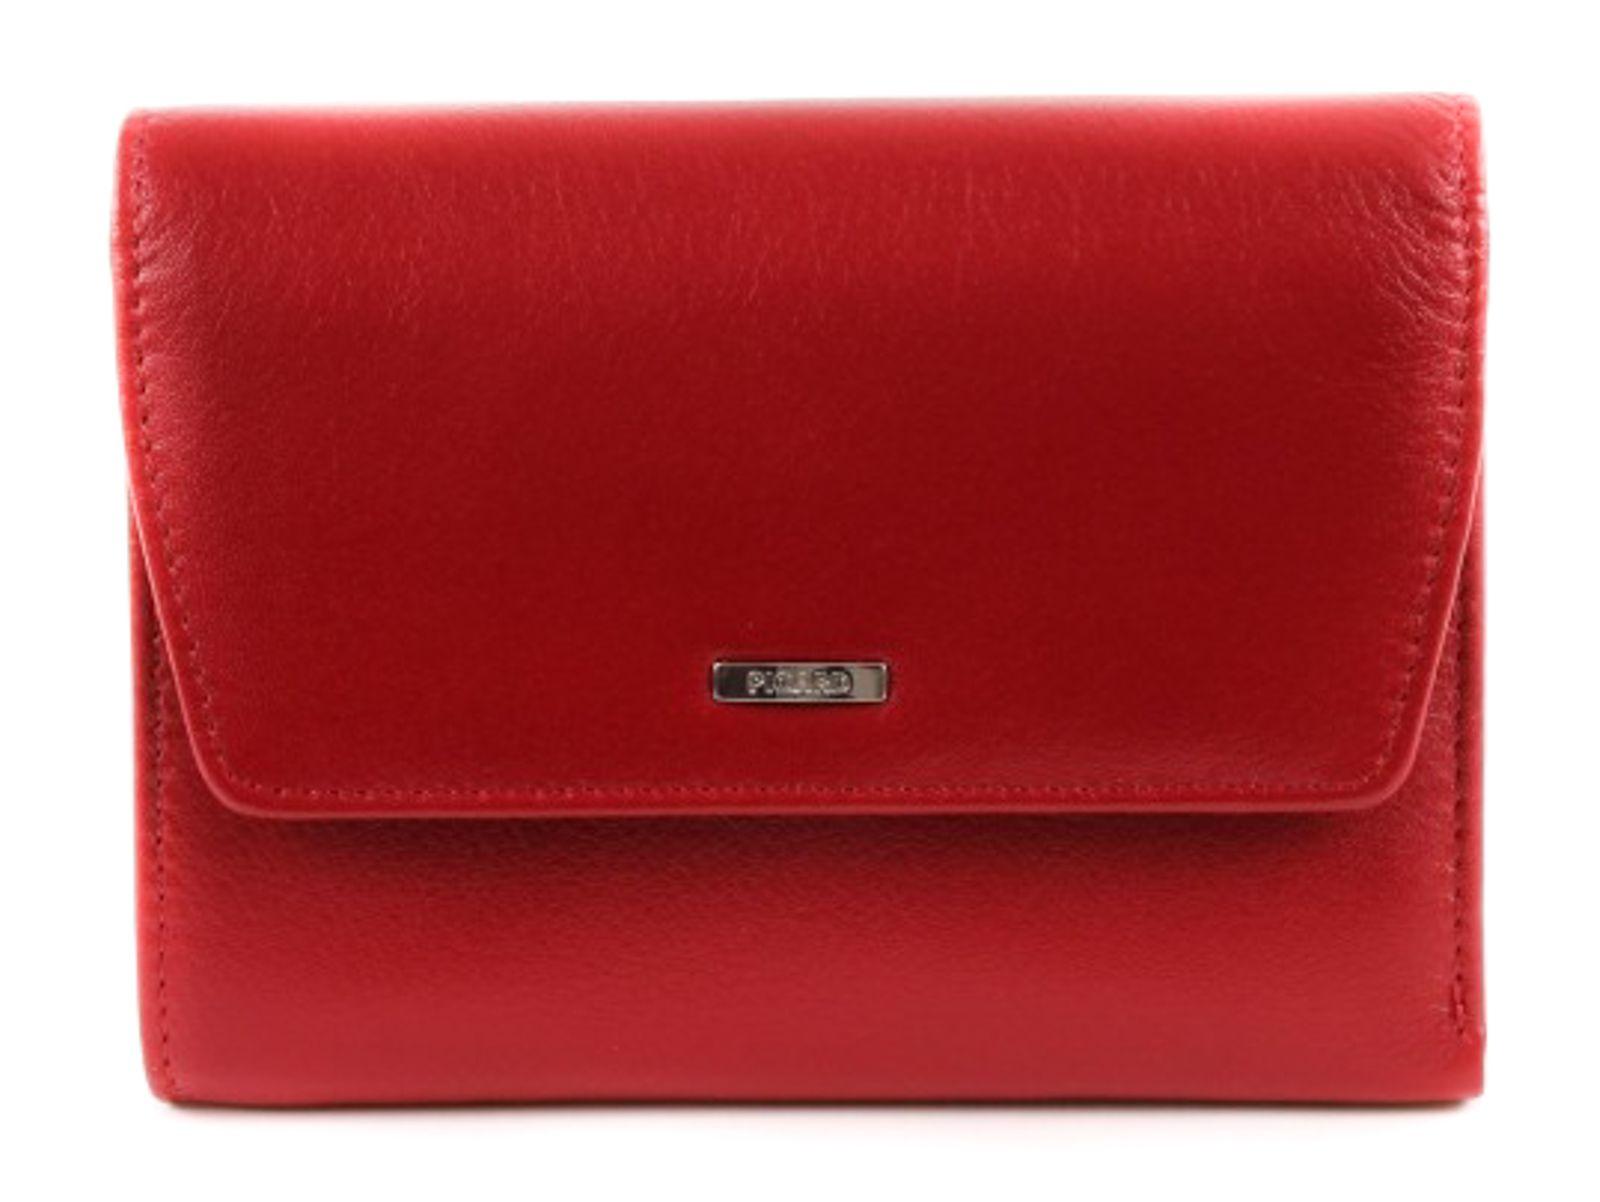 PICARD Bingo Flap Wallet Red